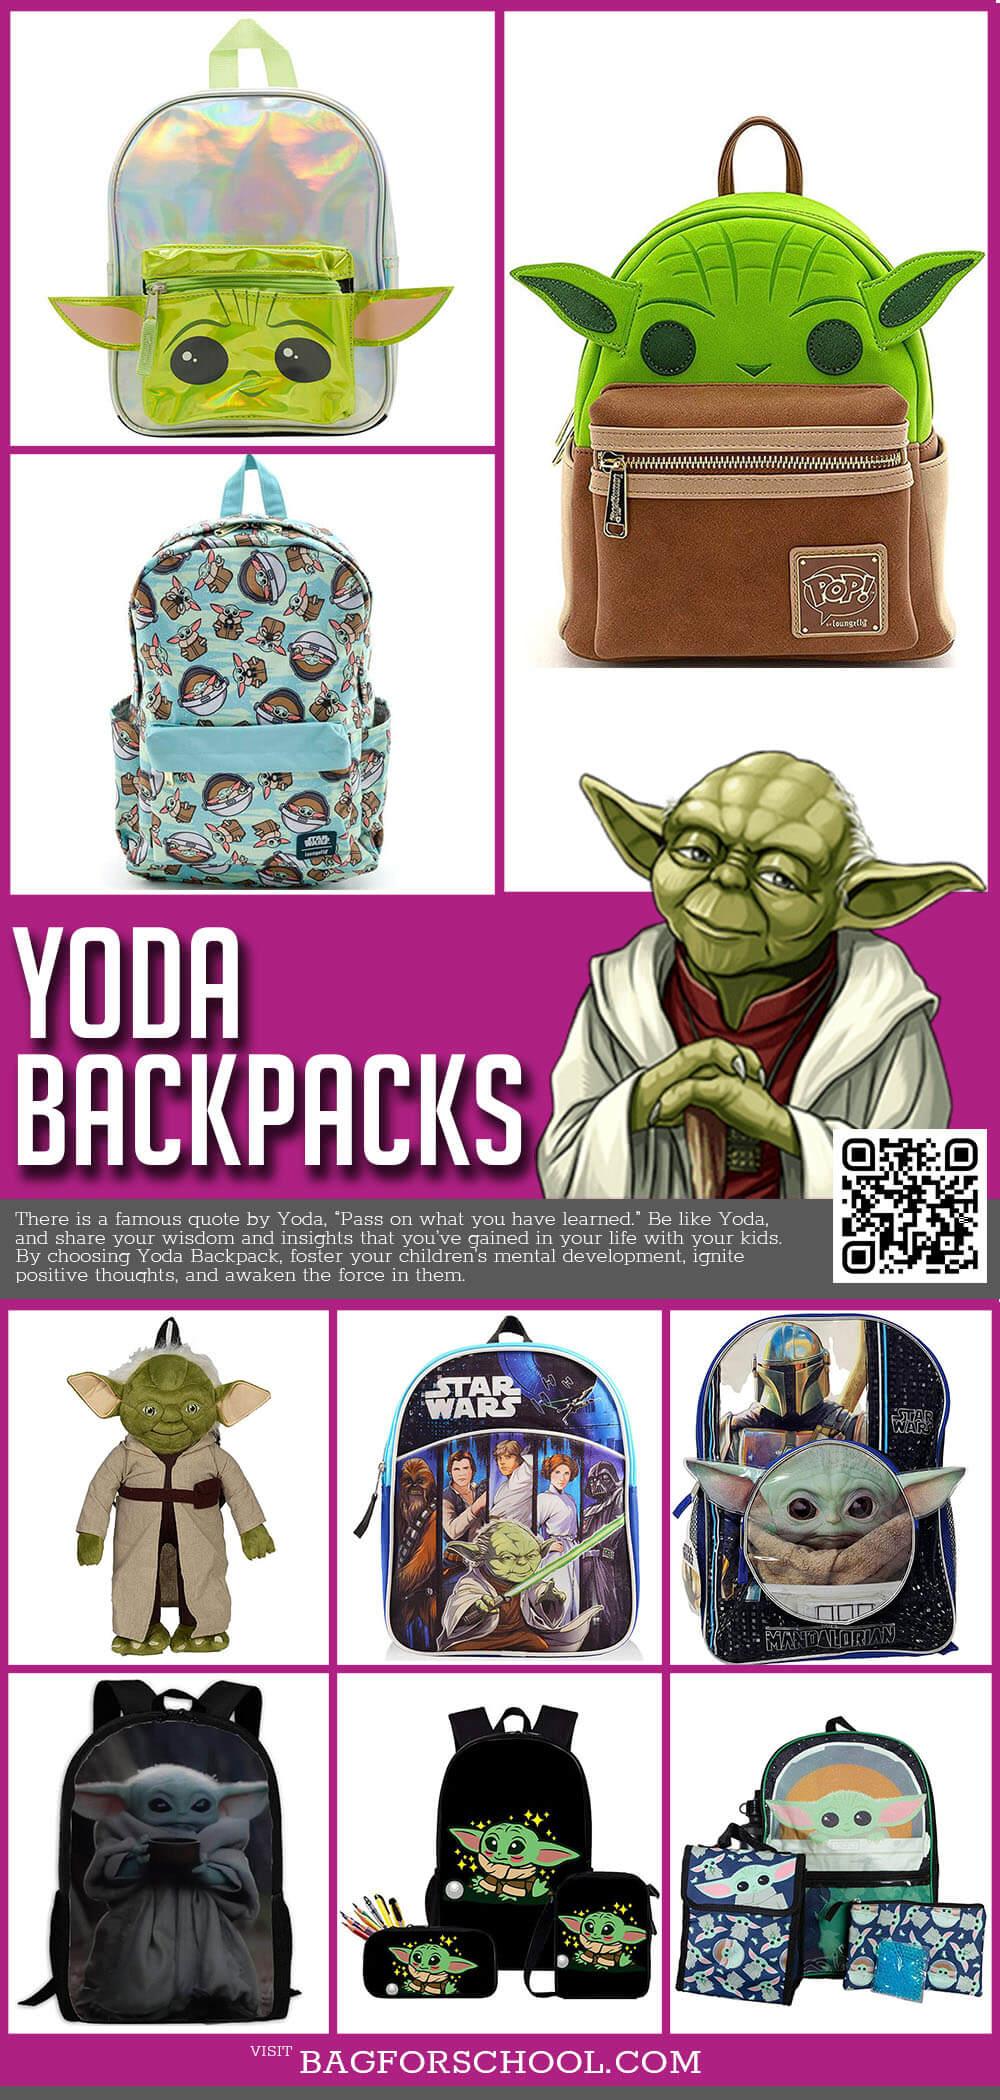 Yoda Backpacks